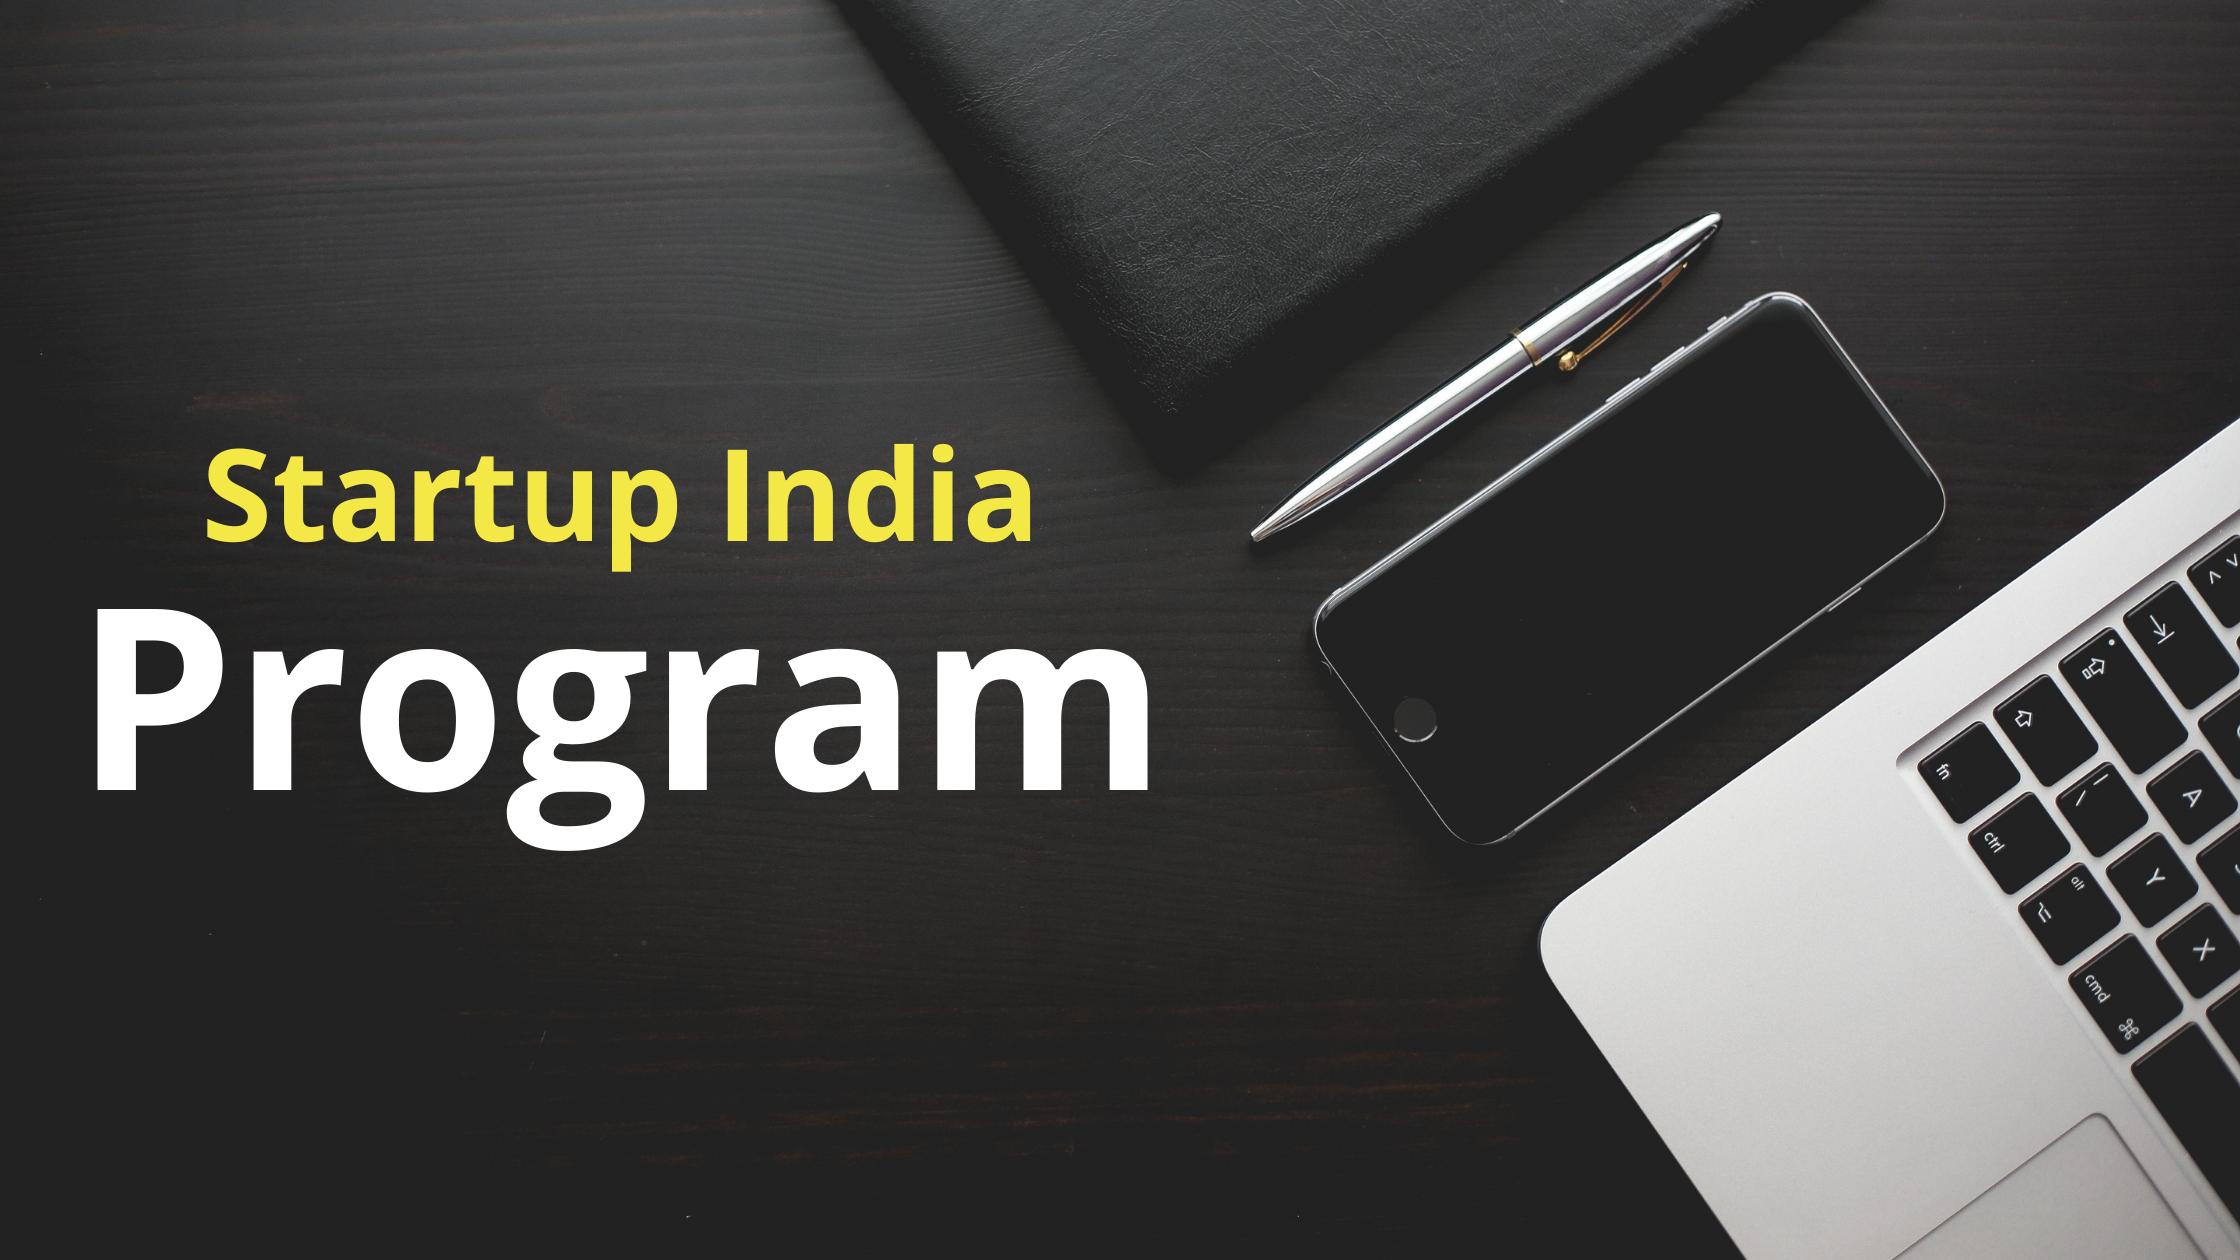 startup India program